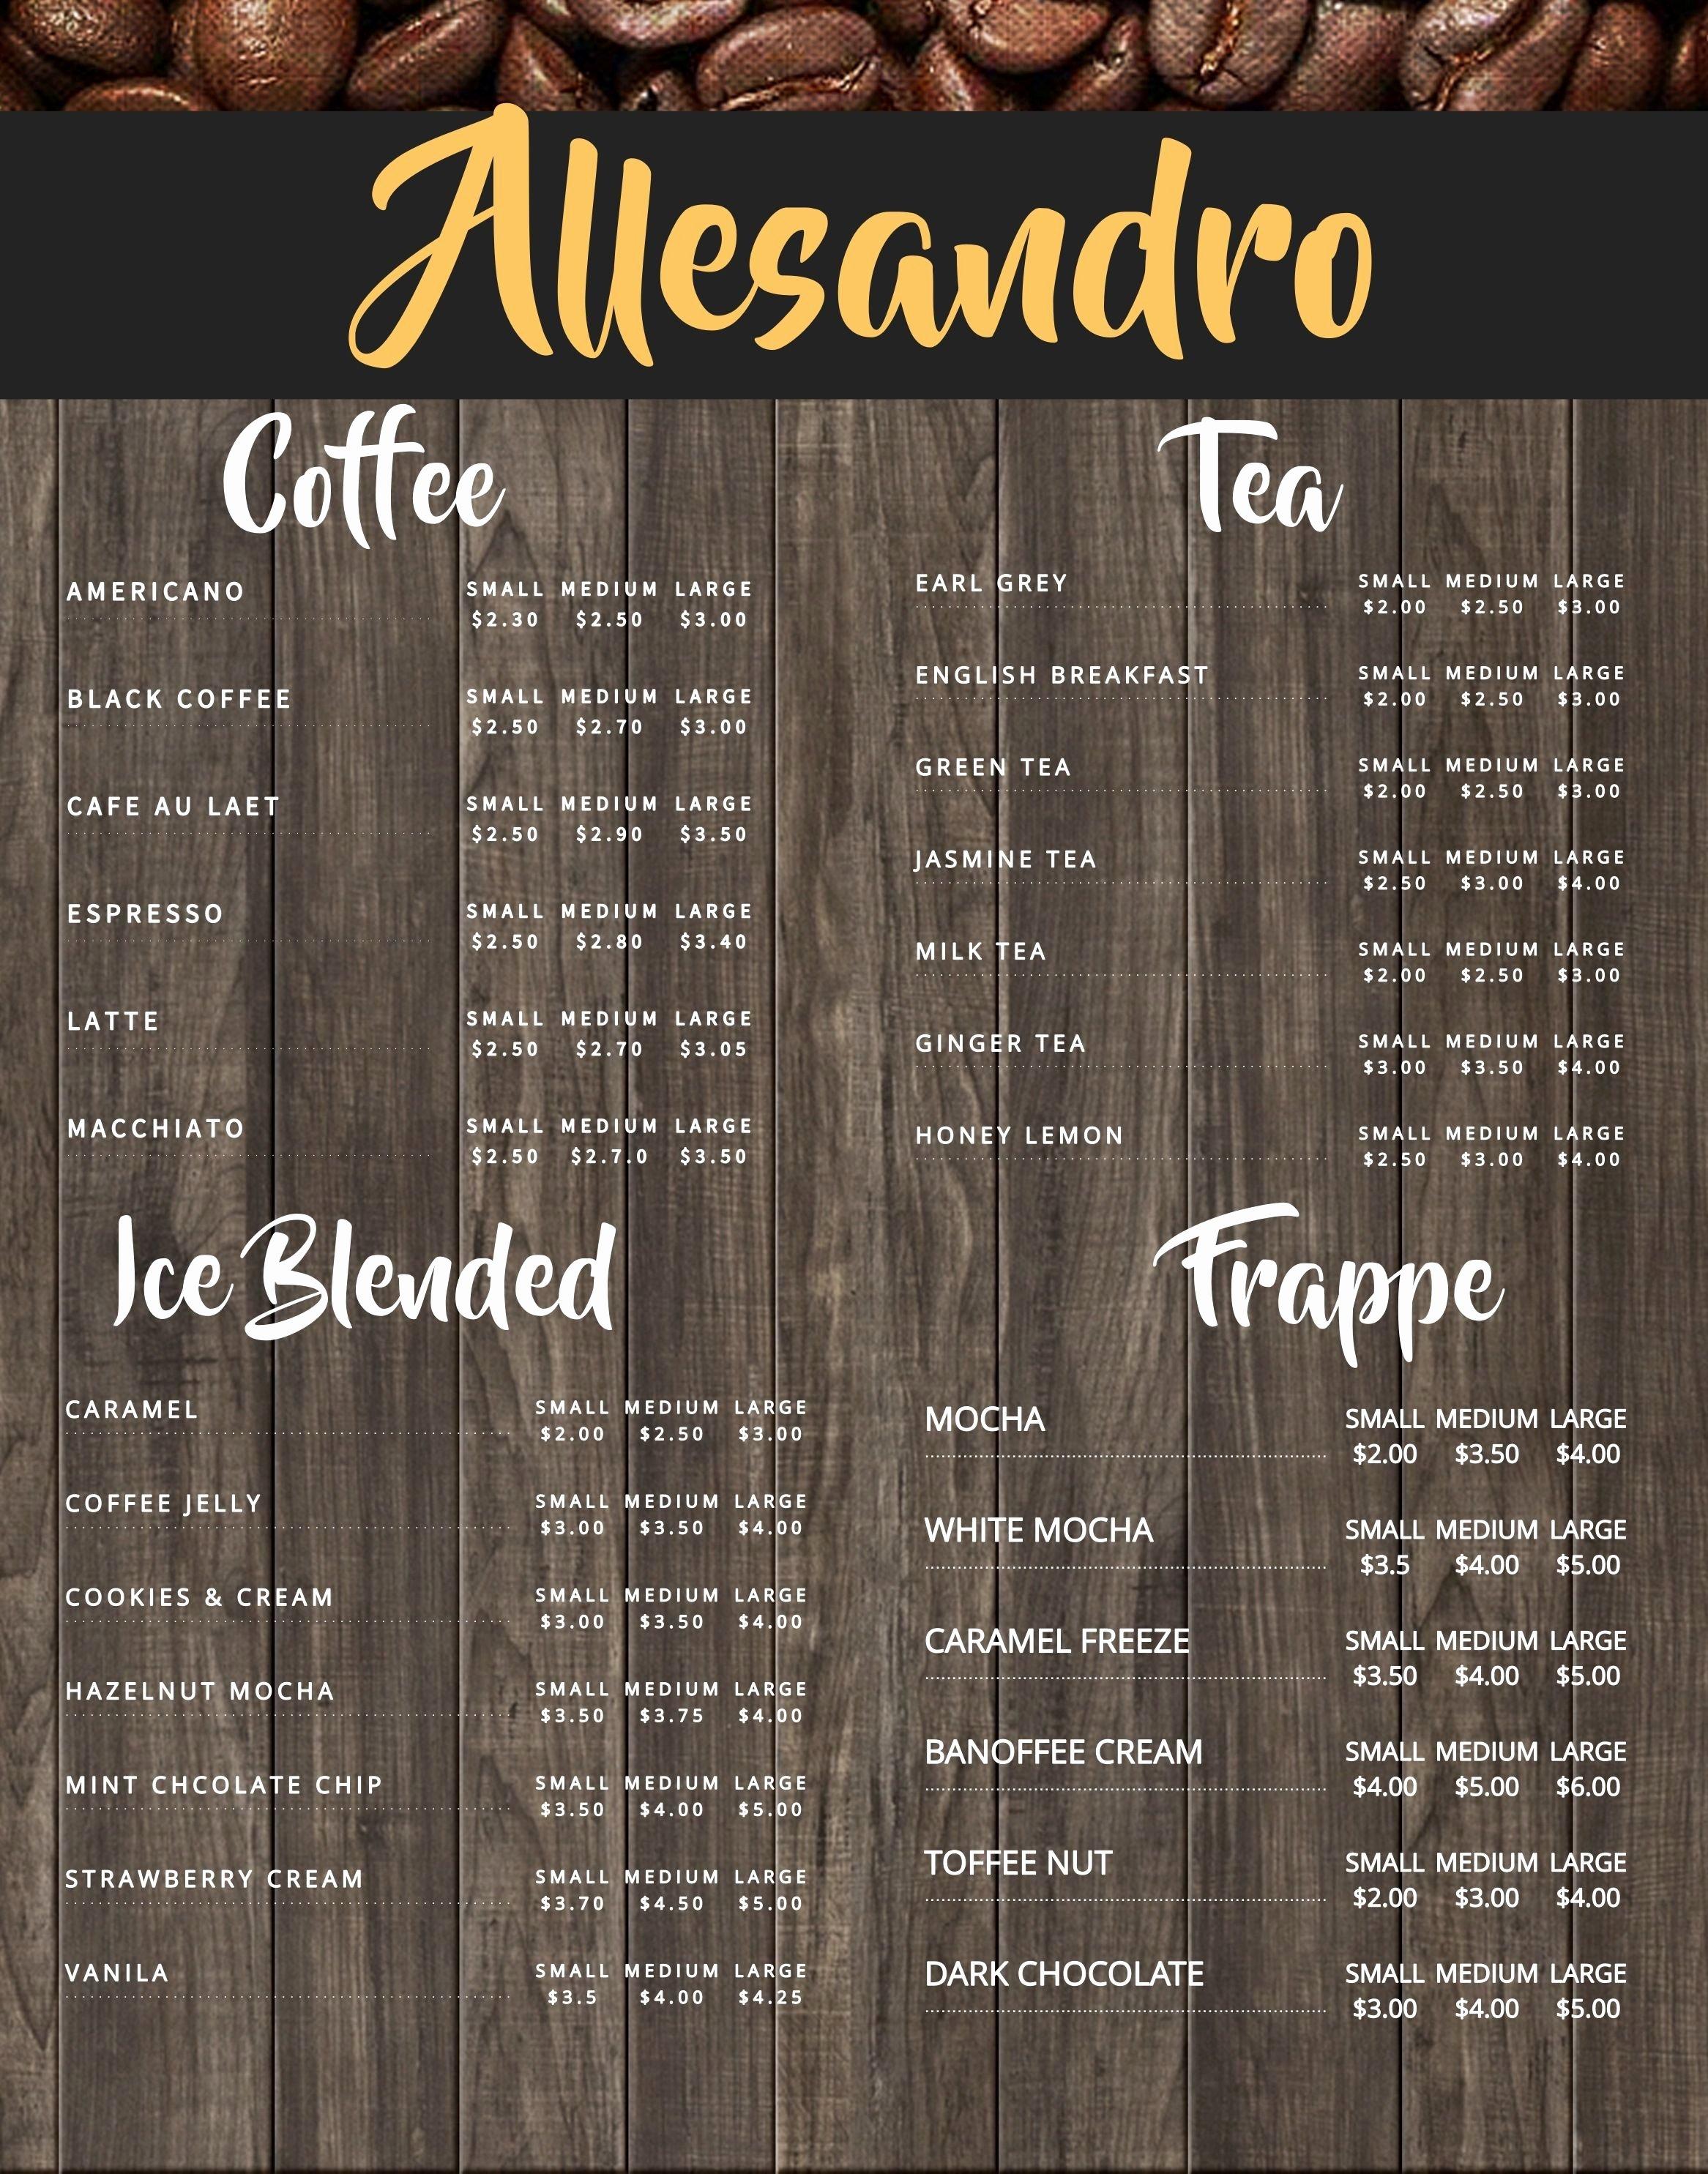 Coffee Shop Menu Template Inspirational Coffee Shop Menu Board Design Template to Customize